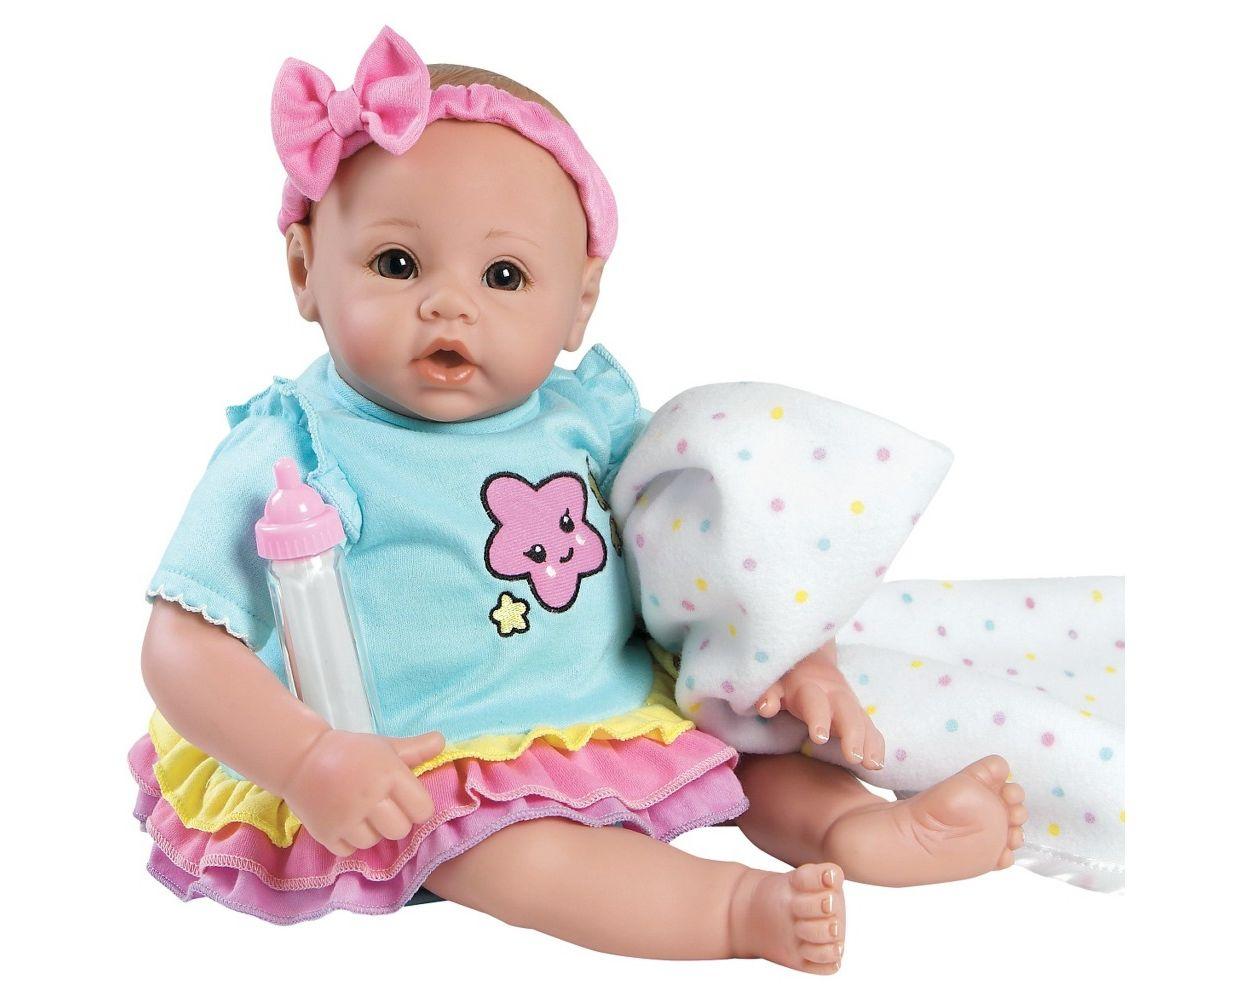 Кукла Adora Baby Time Rainbow (Адора Детское время Радуга)